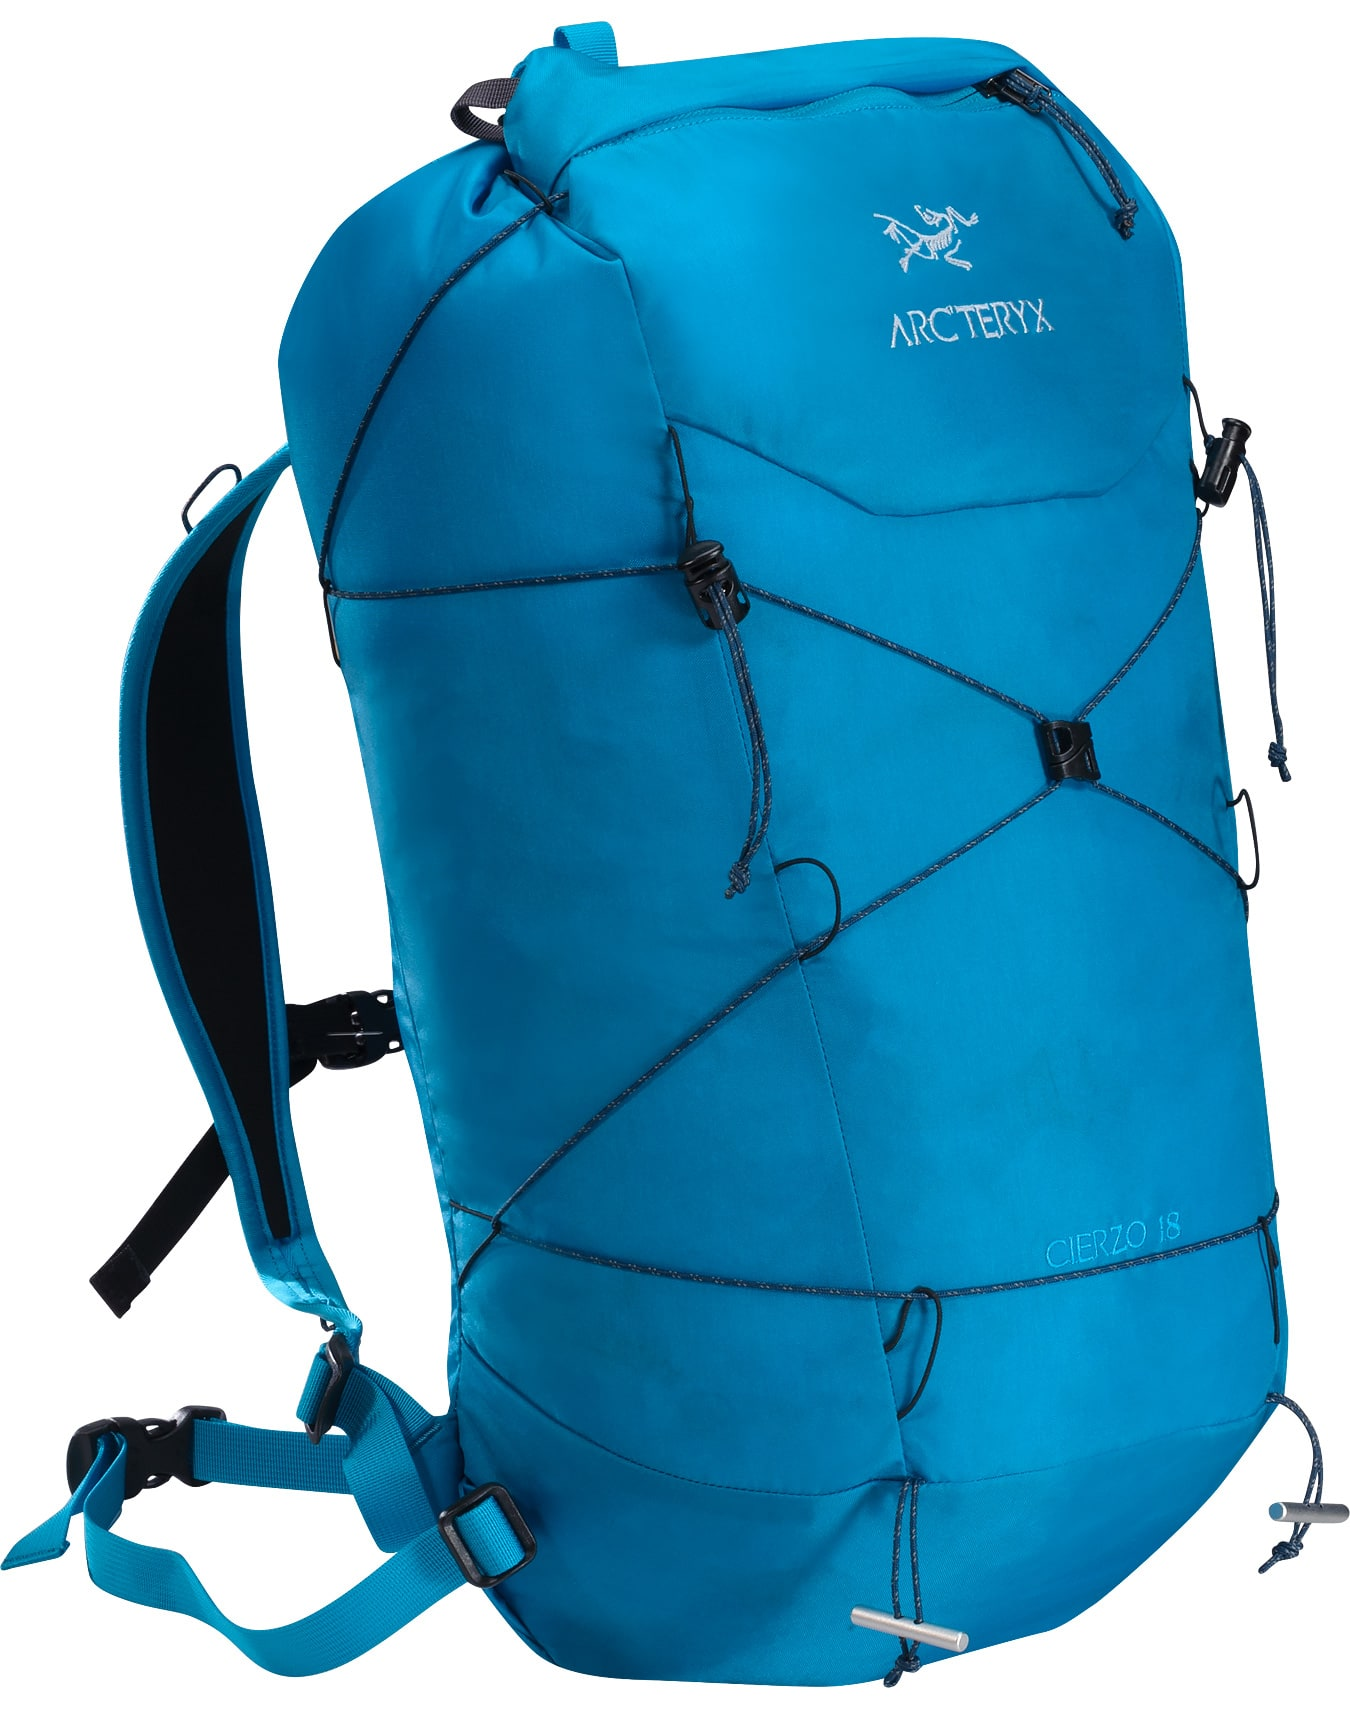 Image of Arc'teryx Cierzo 18 Backpack